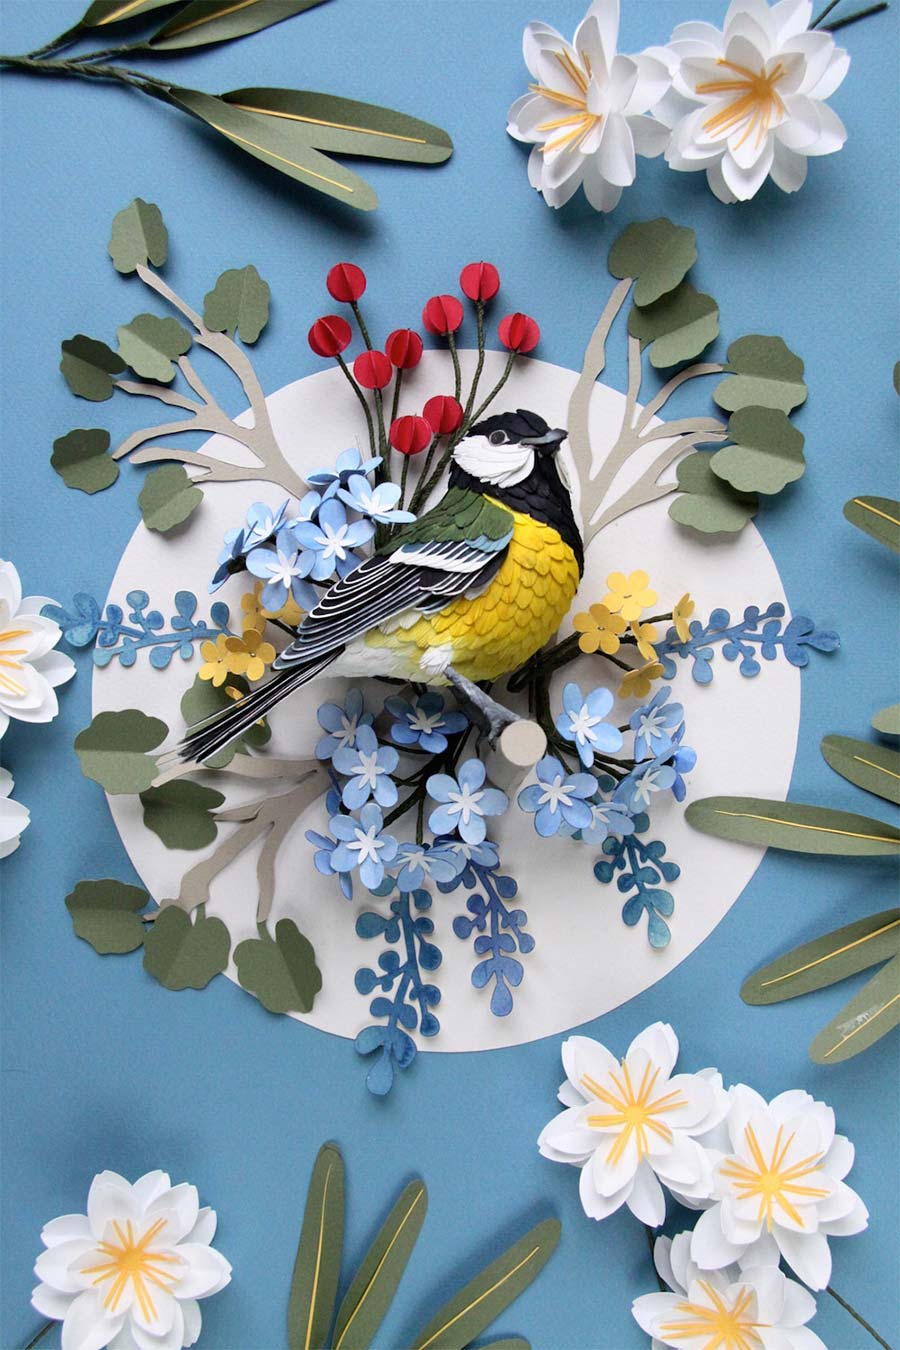 Neue Papiervögel von Diana Beltran Herrera diana-beltran-herrera-2_03